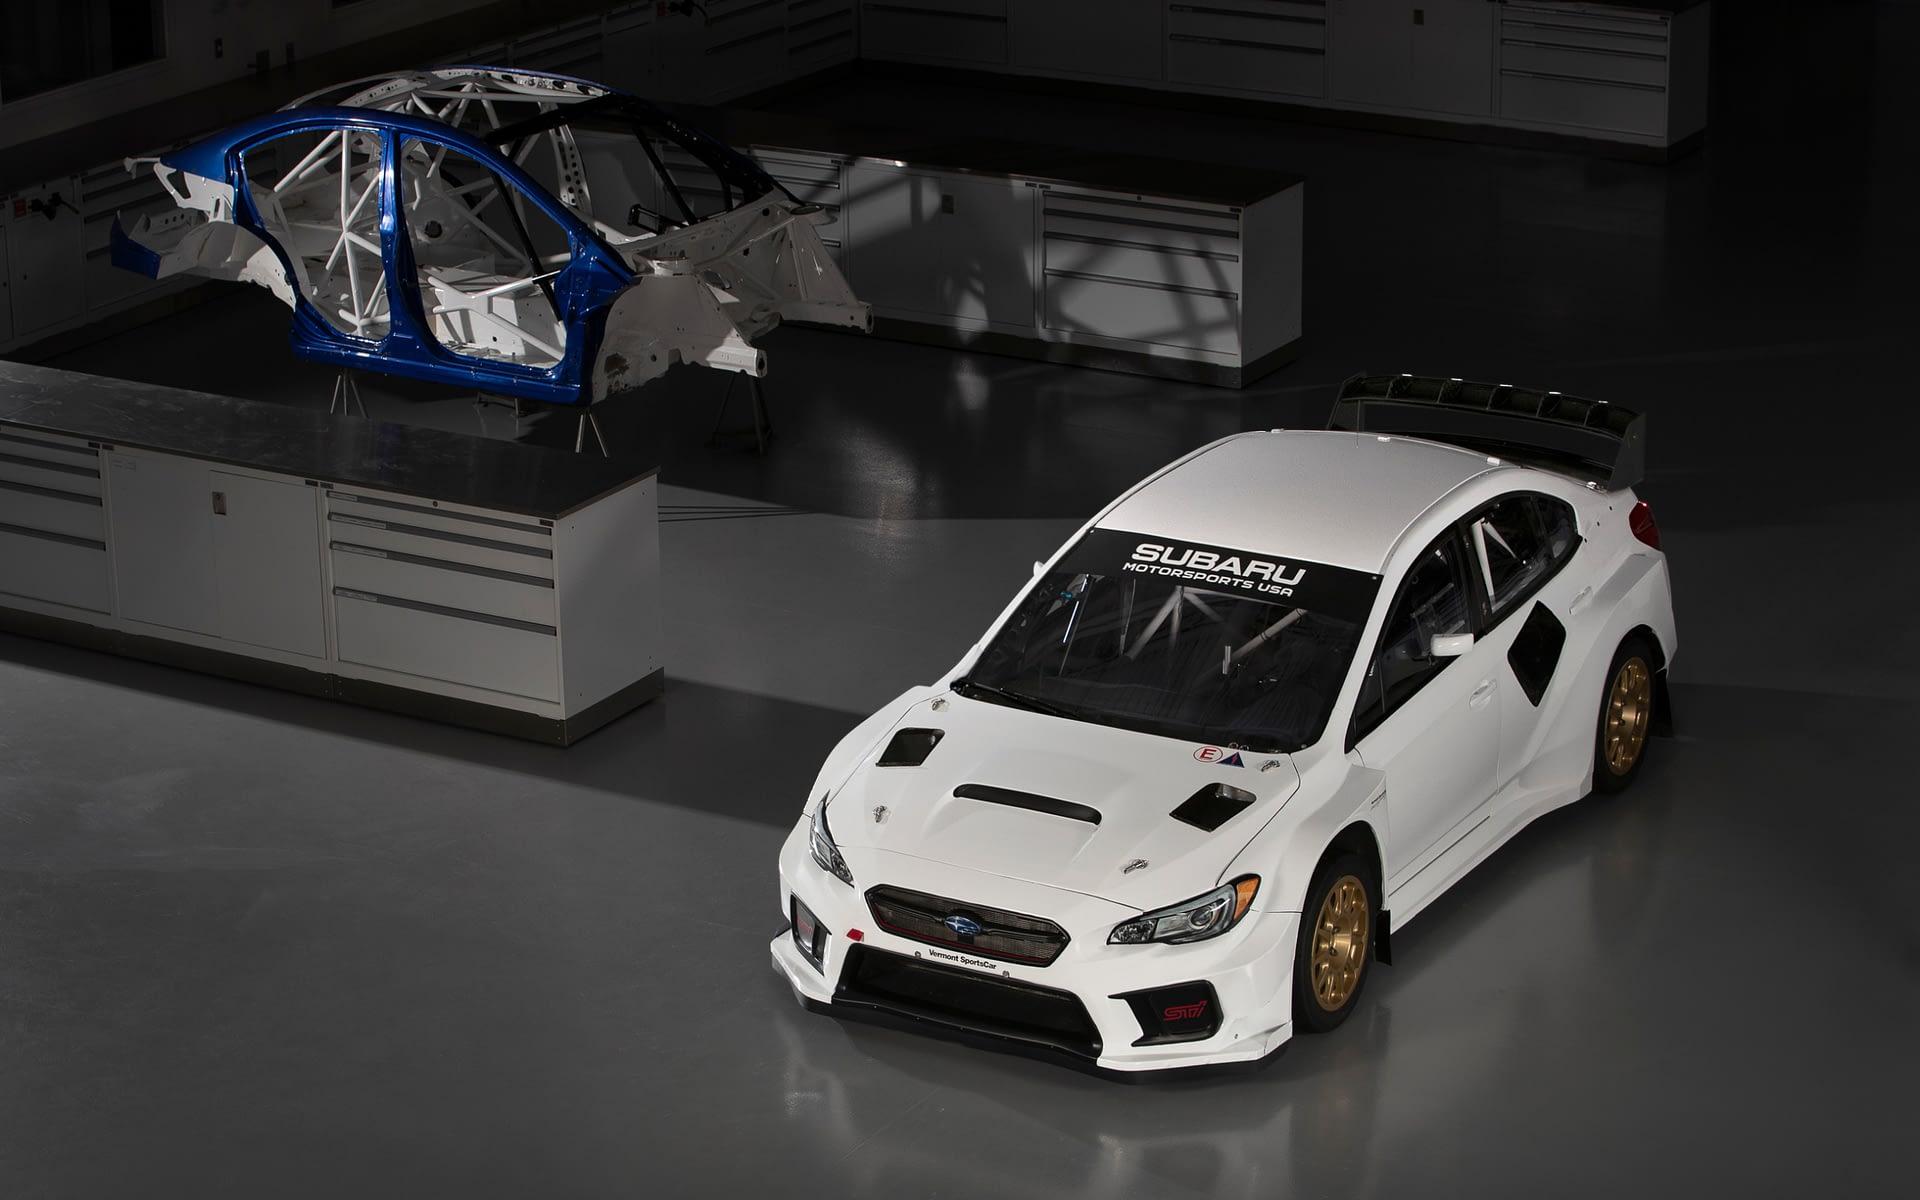 2019 Subaru Rallycross White Studio scaled